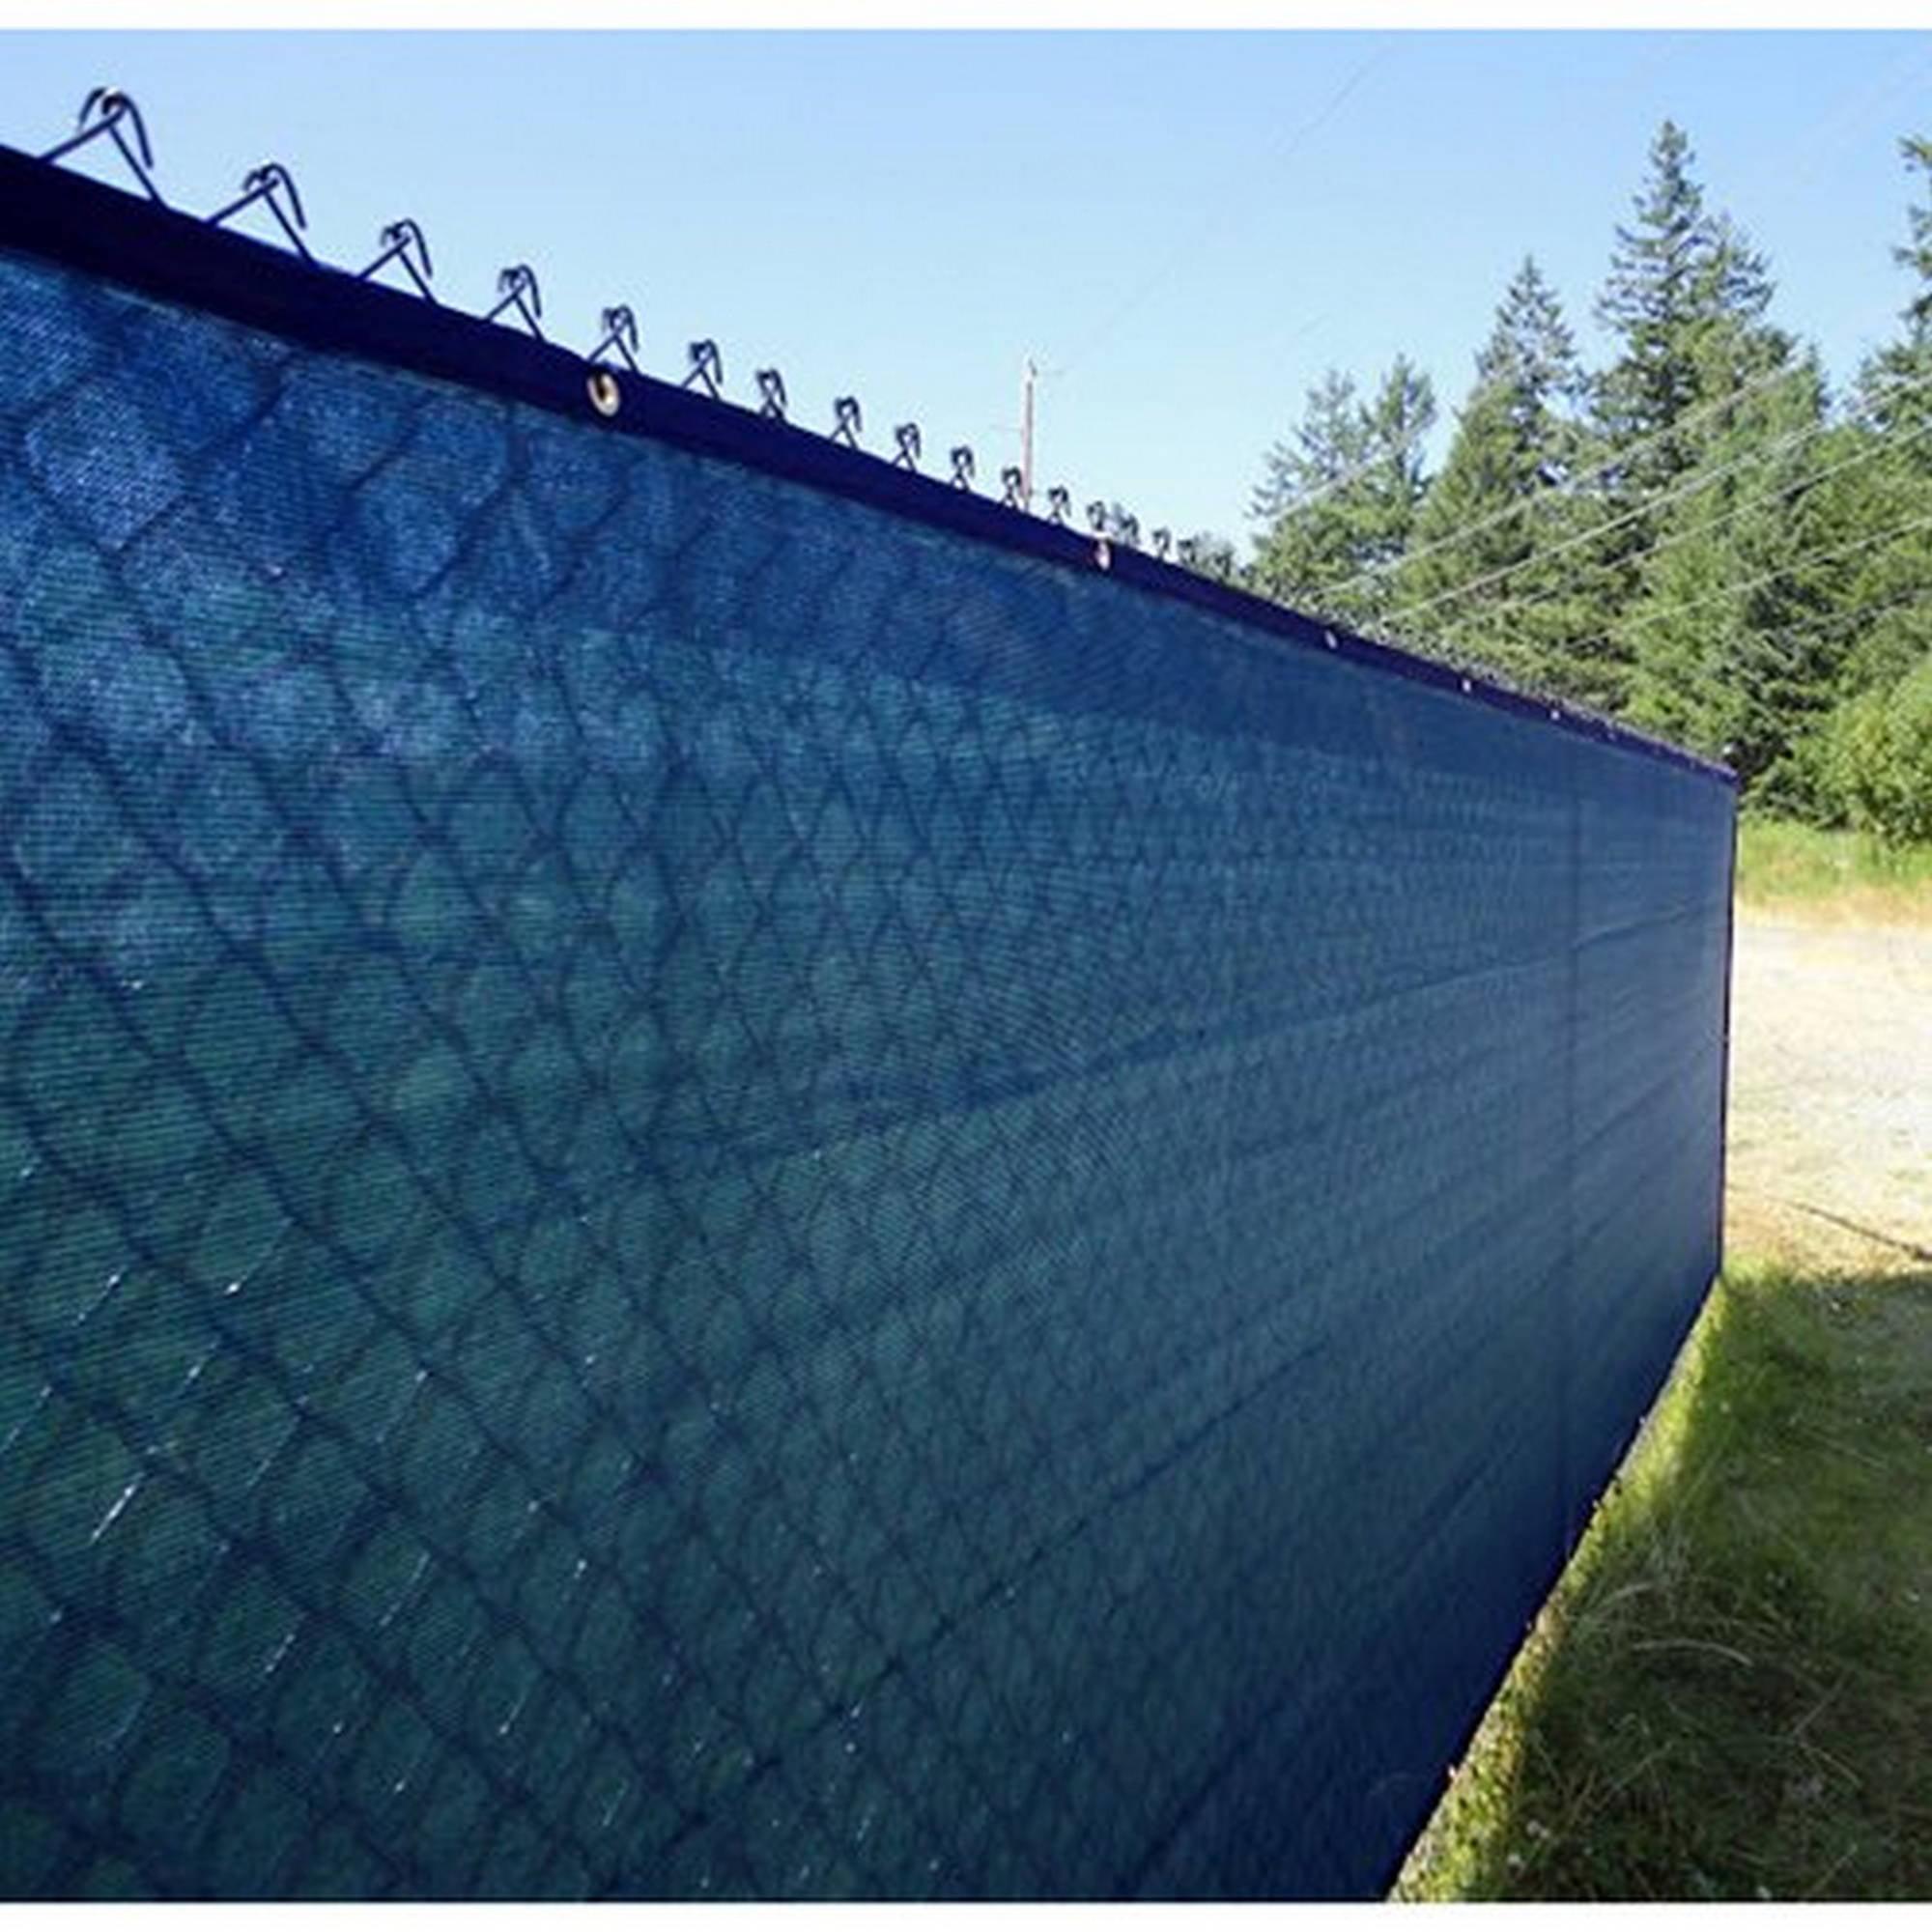 Aleko 4' x 50' Blue Fence Privacy Screen Outdoor Backyard Fencing Privacy Windscreen by ALEKO